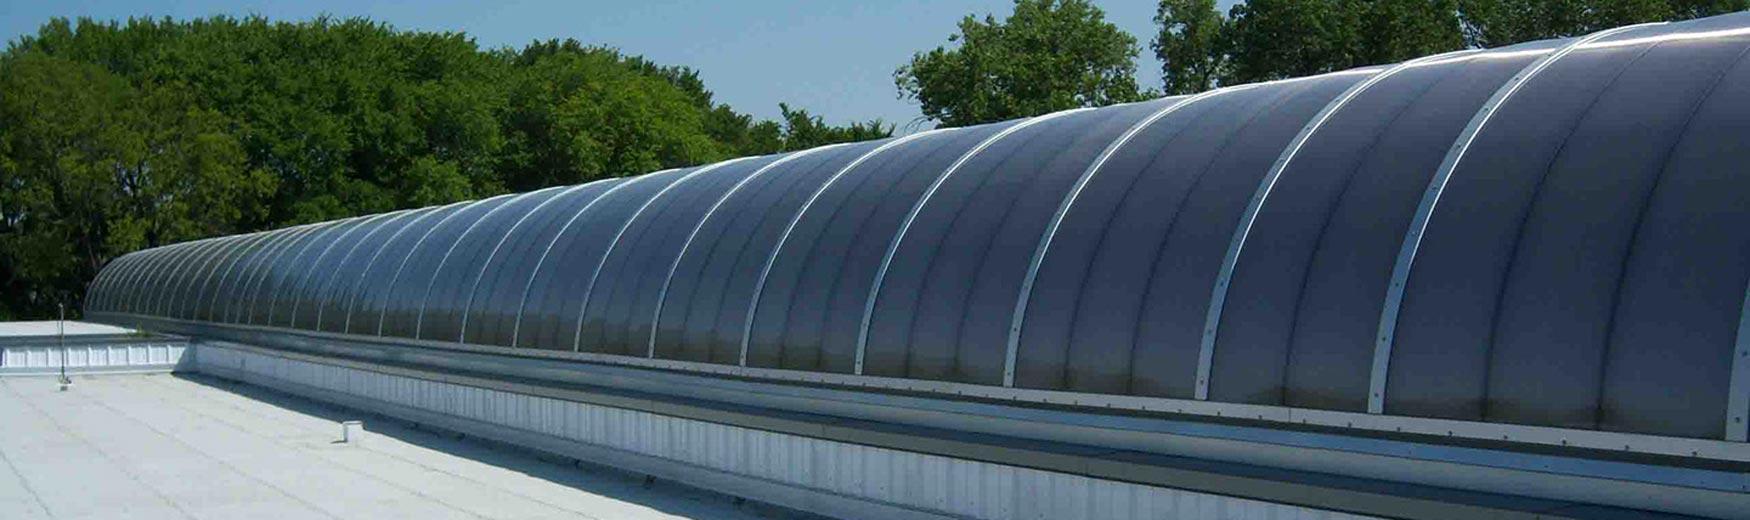 pre engineered skylights